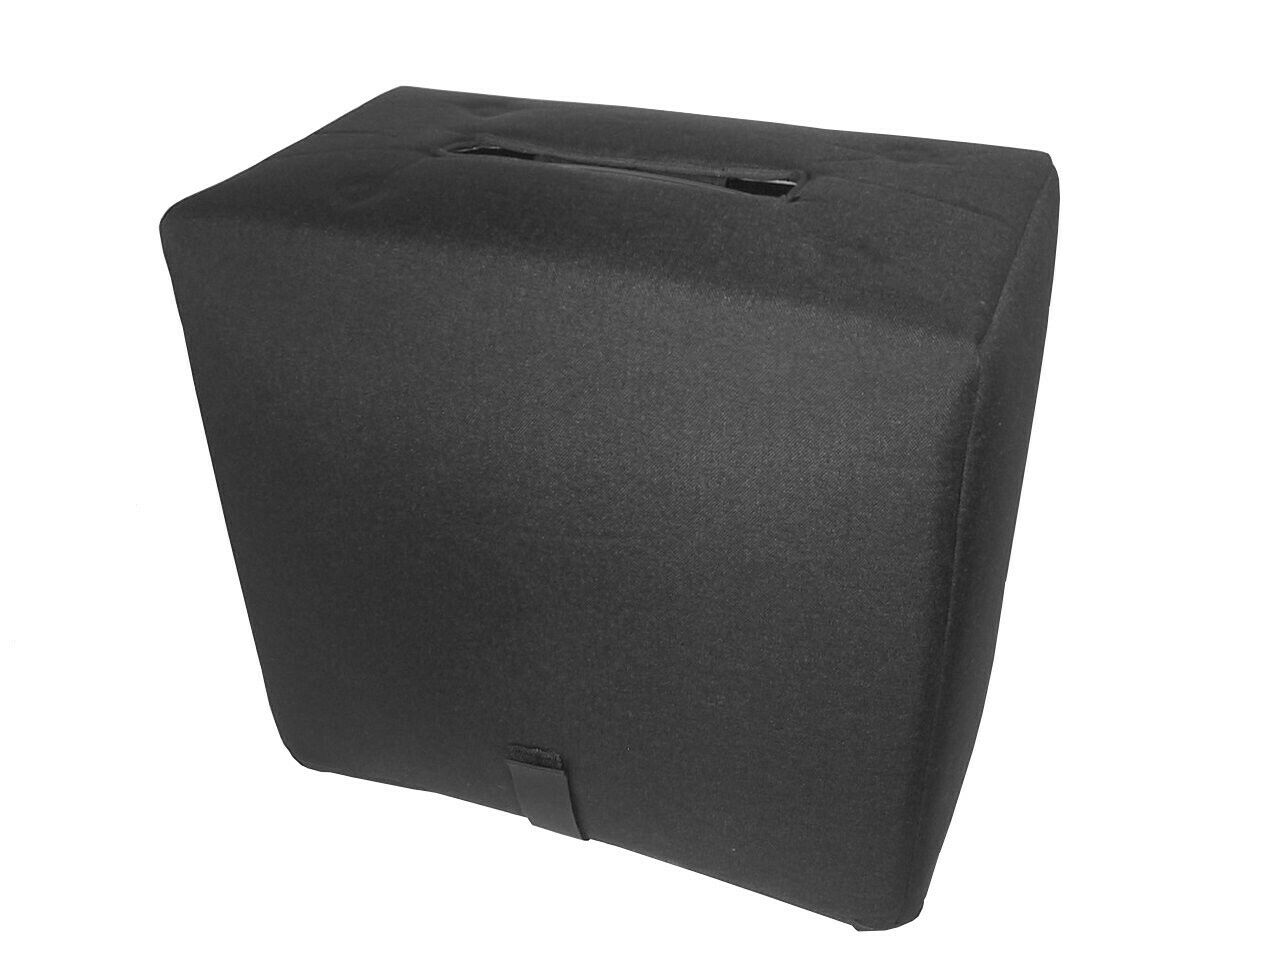 Talos Basic 1x12 Combo Amp Cover - schwarz, Heavy Duty, Water Resistant (talo001p)